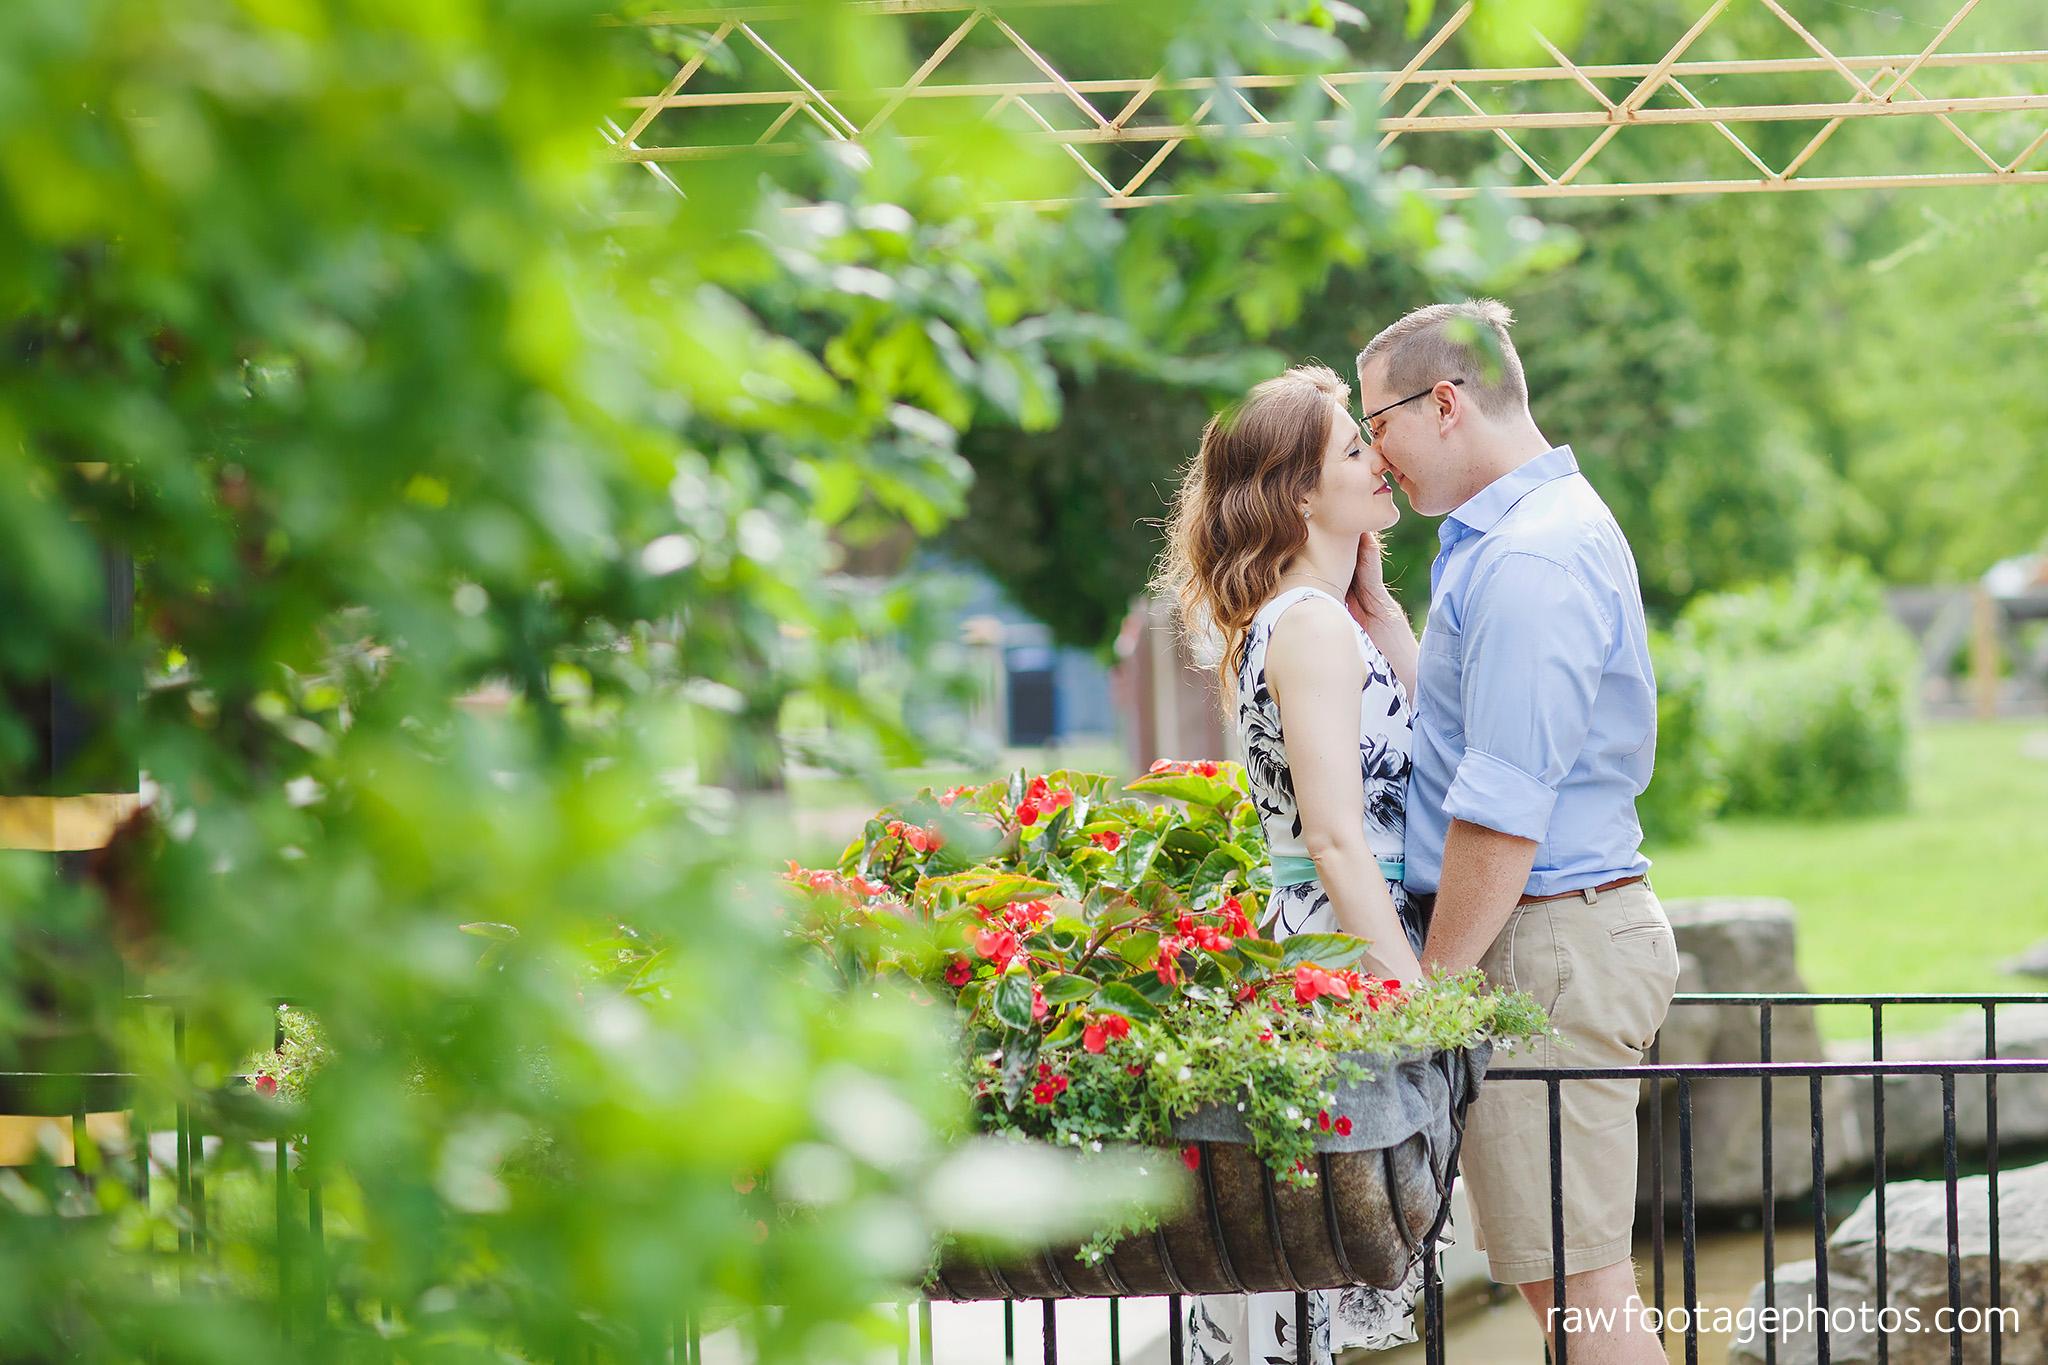 london_ontario_wedding_photographer-storybook_gardens_engagement_session-raw_footage_photography017.jpg